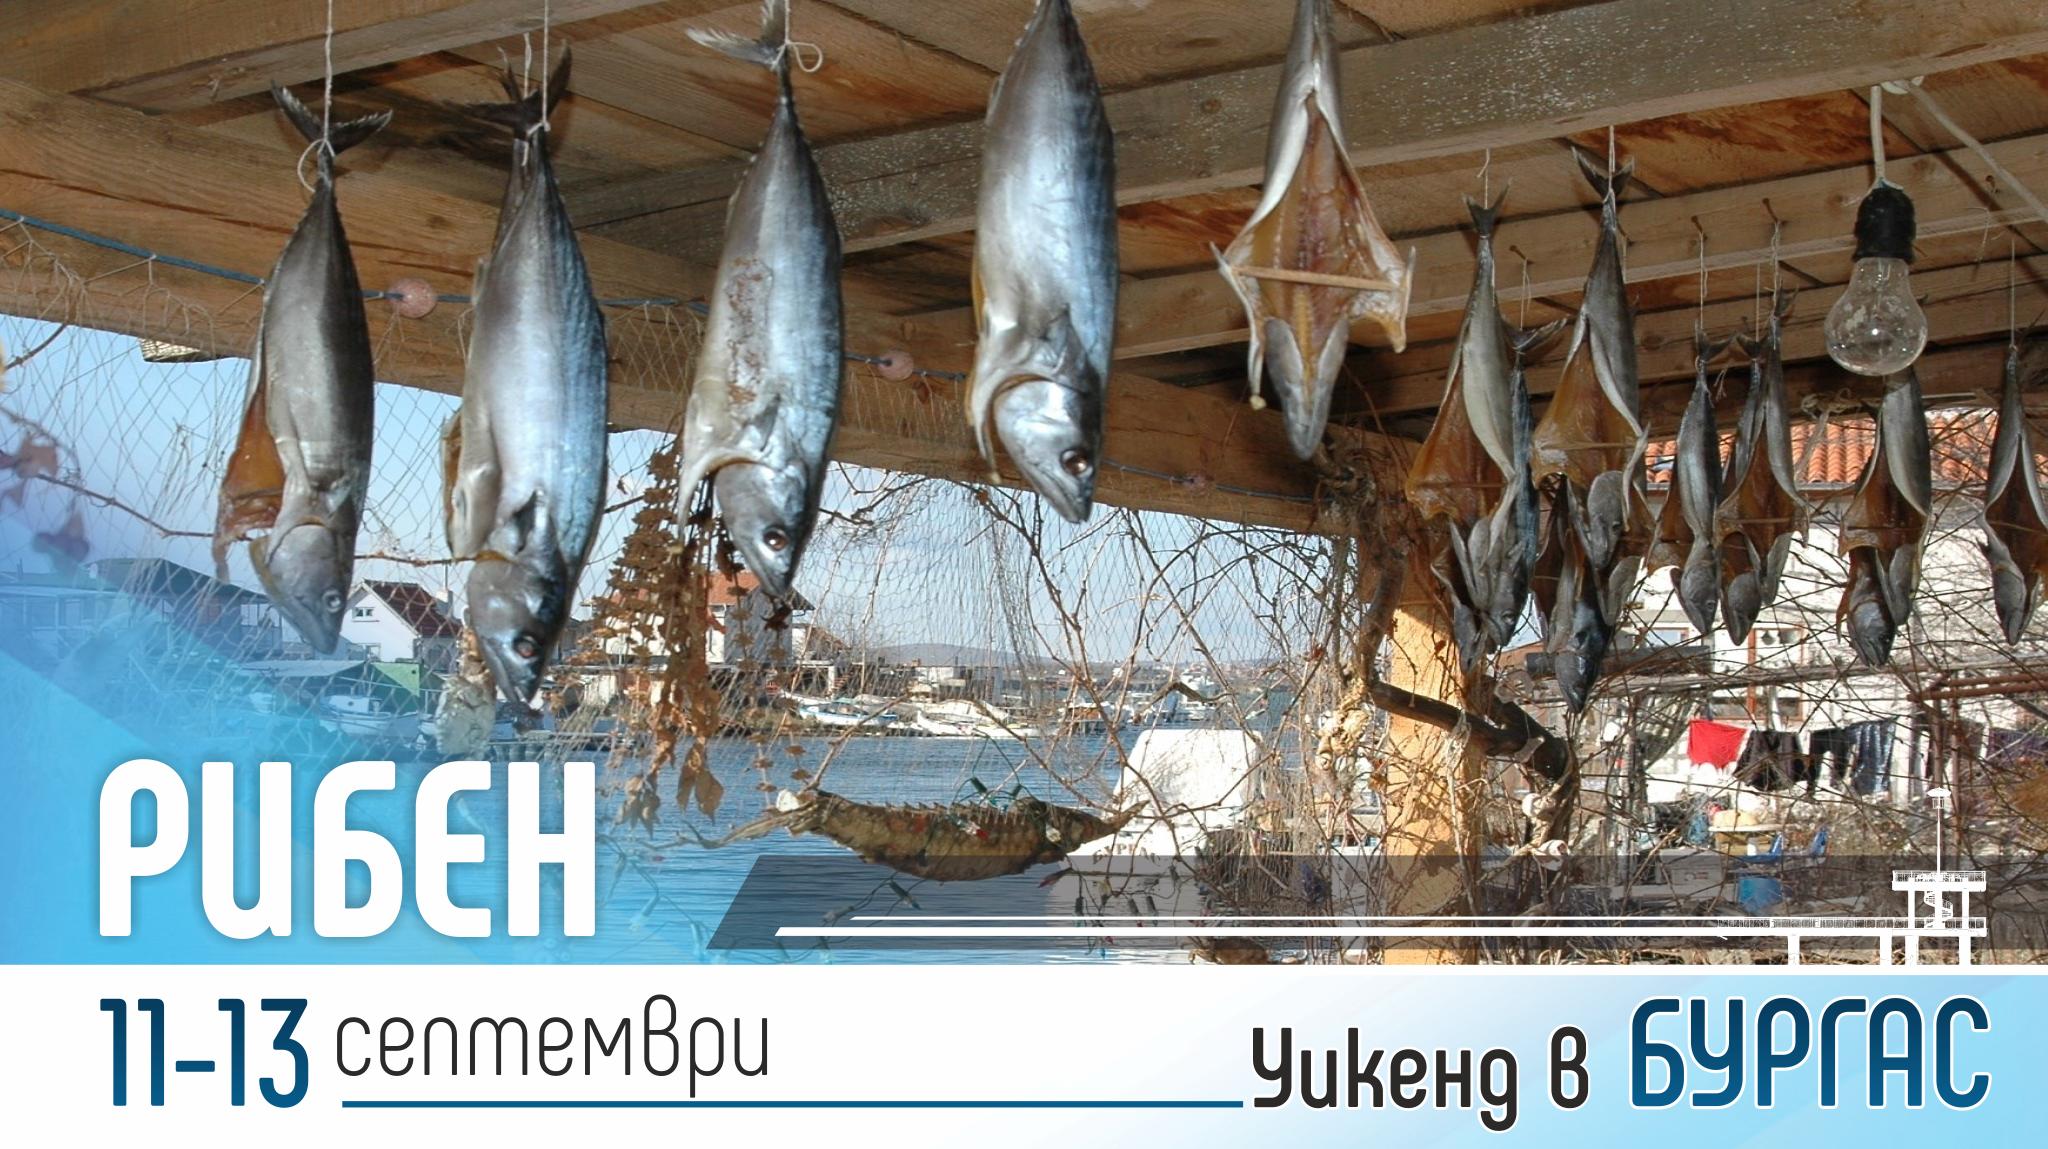 Рибен уикенд в Бургас 11-13 септември